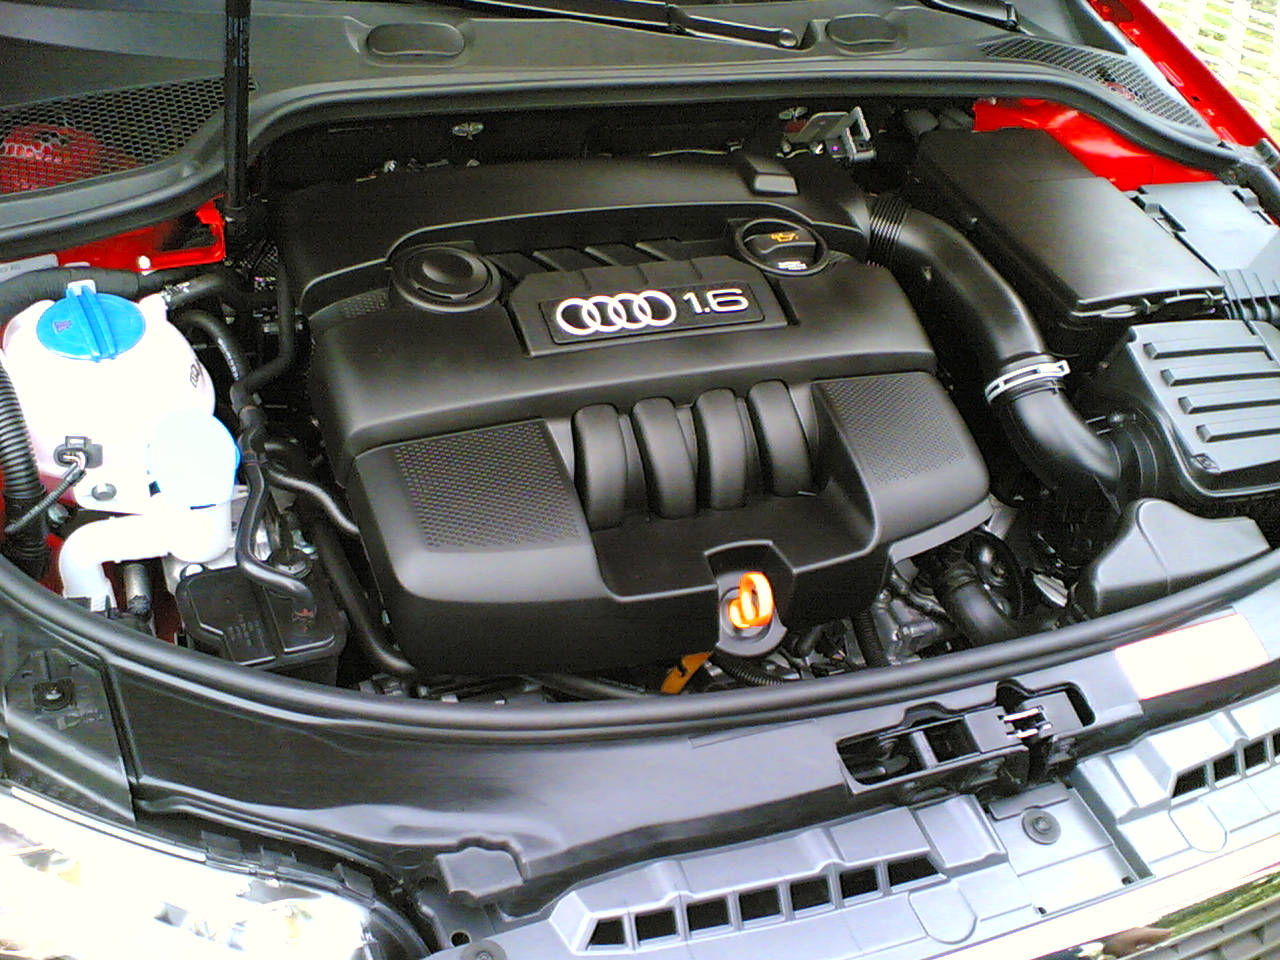 Audi Engine Schematics Tt Mk Diagram Wiring Diagrams E Bay Image A3 On